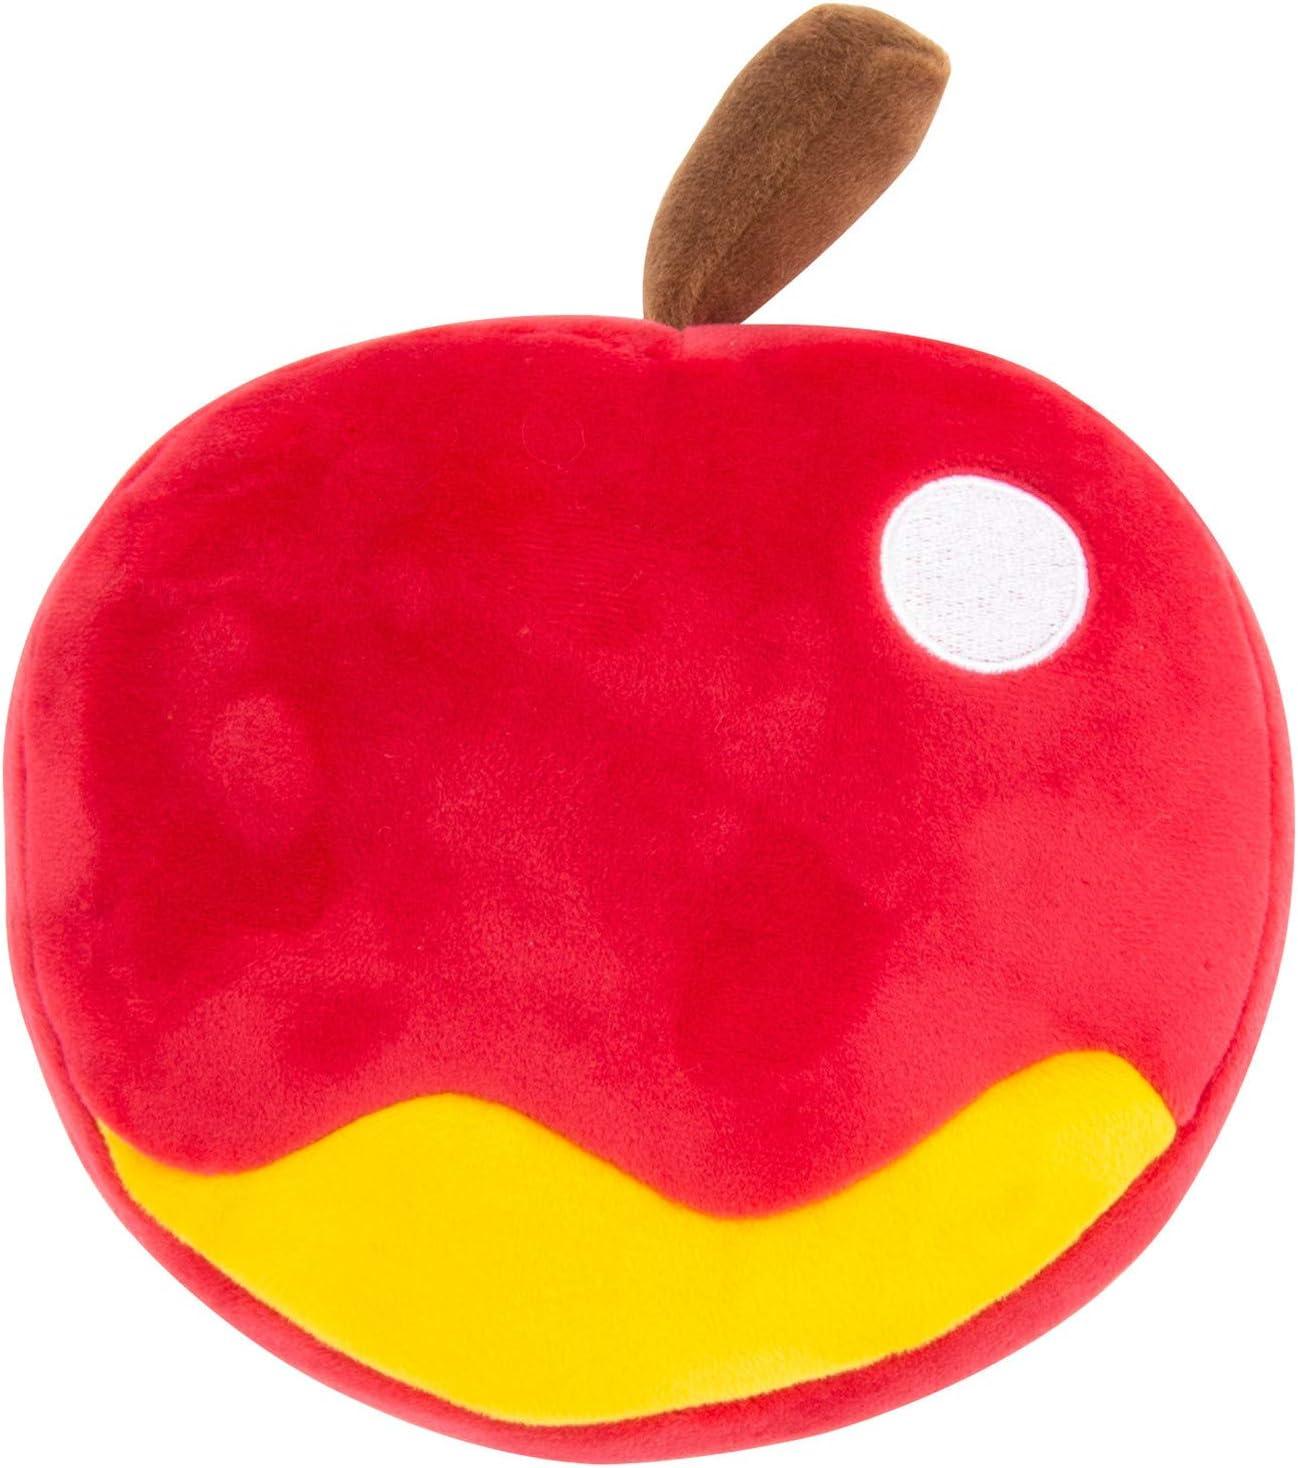 Club Mocchi Mocchi Nintendo Animal Crossing Apple 6 Inch Junior Plush Stuffed Toy